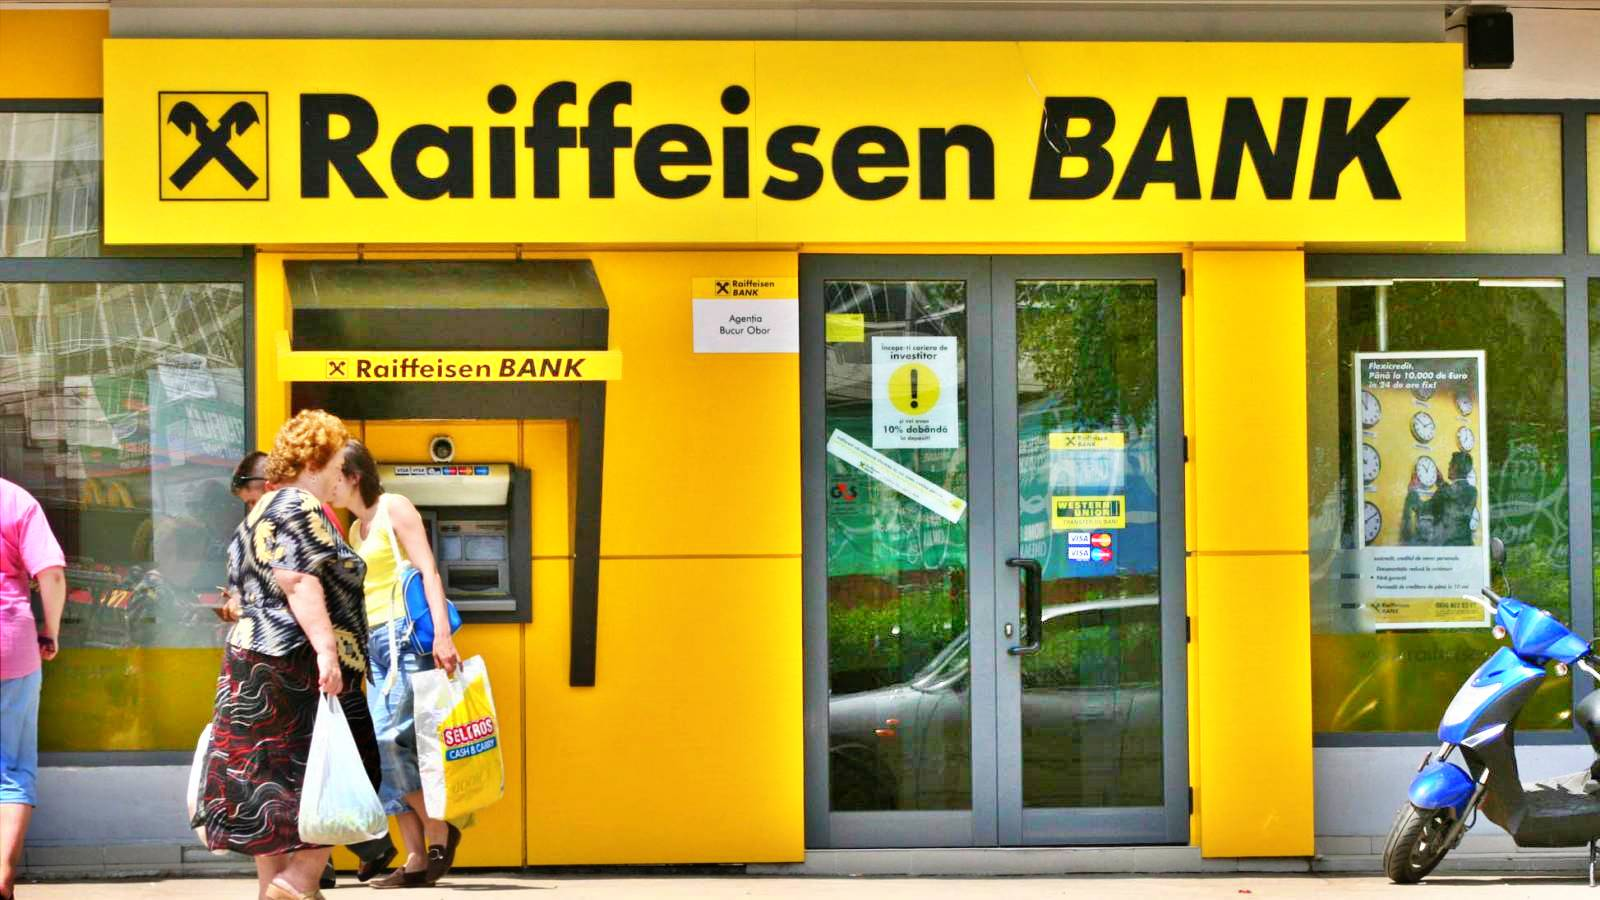 Raiffeisen Bank supliment